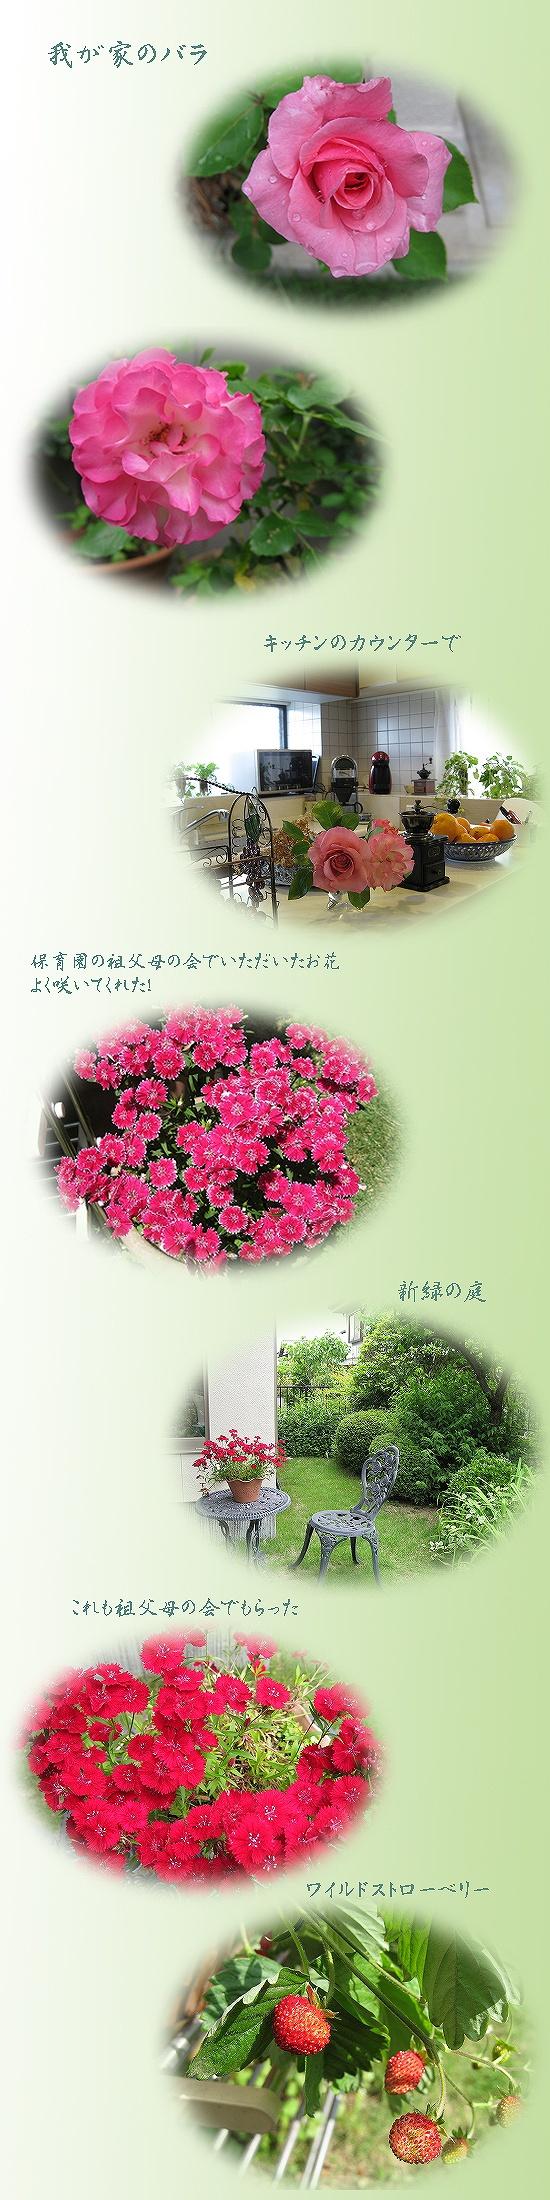 c0121496_18263852.jpg